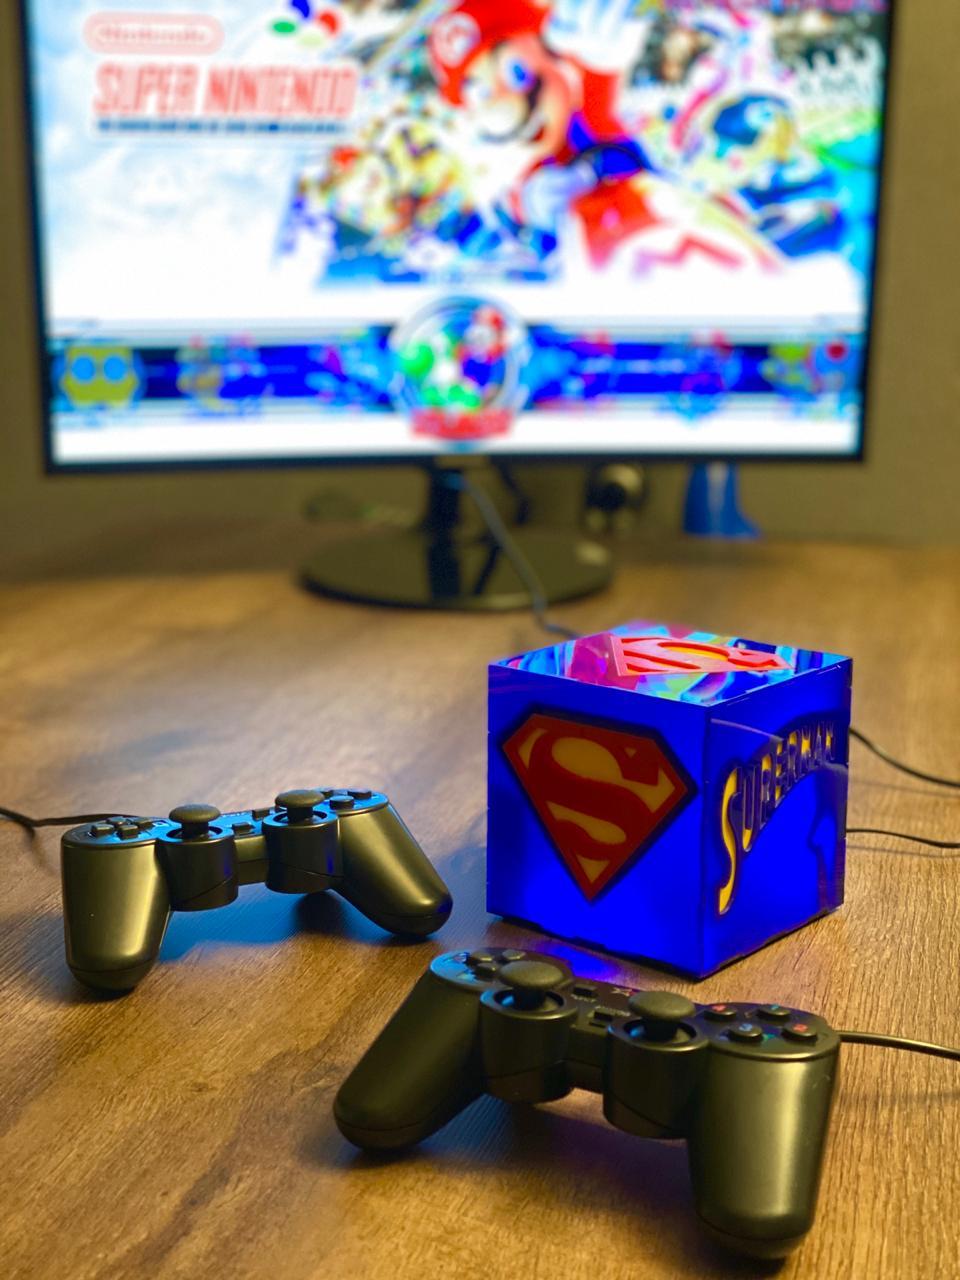 Cubo Retrô Box Super-Homem: Fliperama Arcade Game (20.000 Jogos) PlayStation/Nintendo/SNES/Mega Drive/Sega Saturn